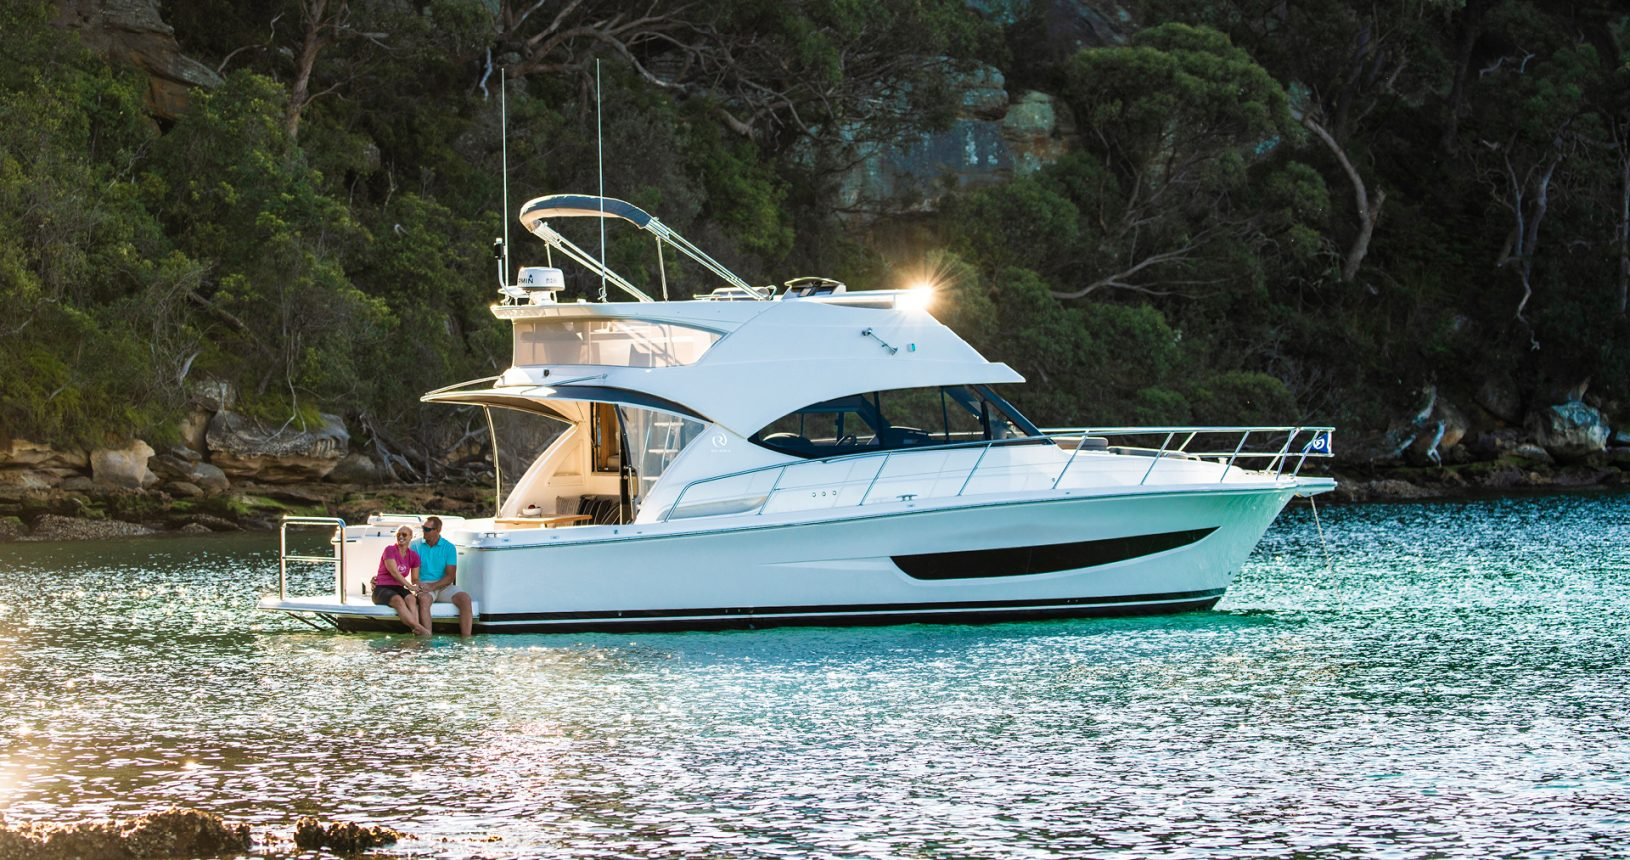 Riviera 39 Sports Motor Yacht - Anchored